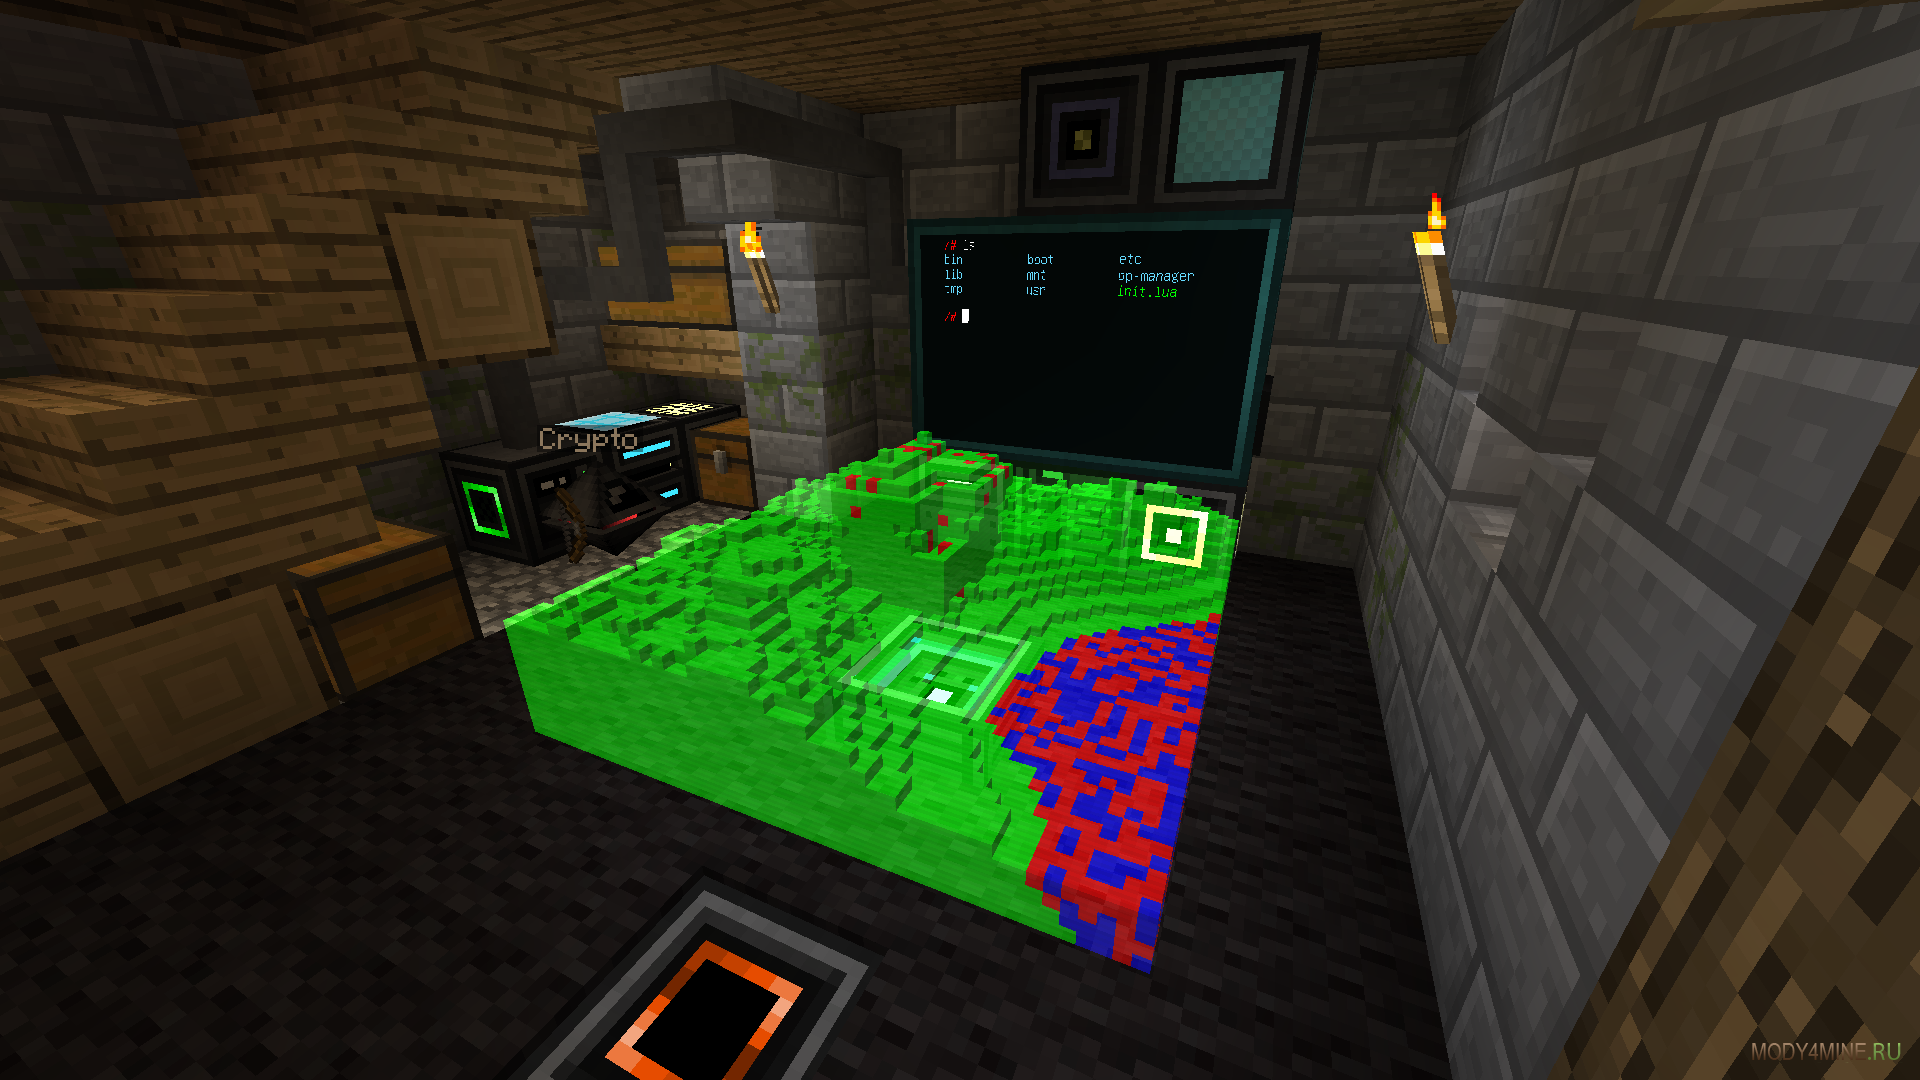 Kingdom keys — мод kingdom hearts для minecraft 1. 12/1. 11. 2/1. 10. 2.